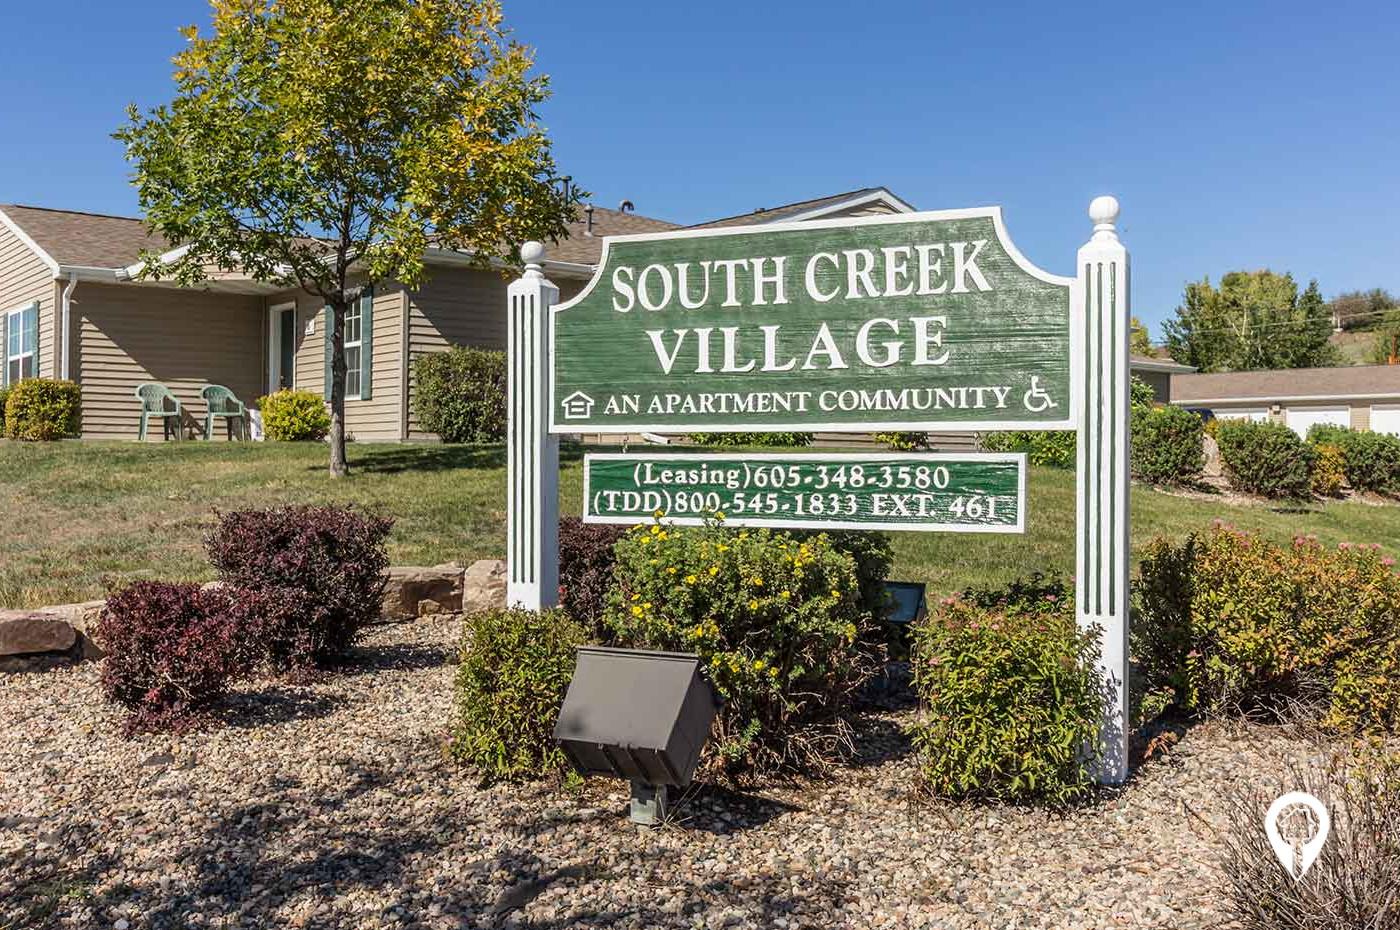 South Creek Village Townhomes